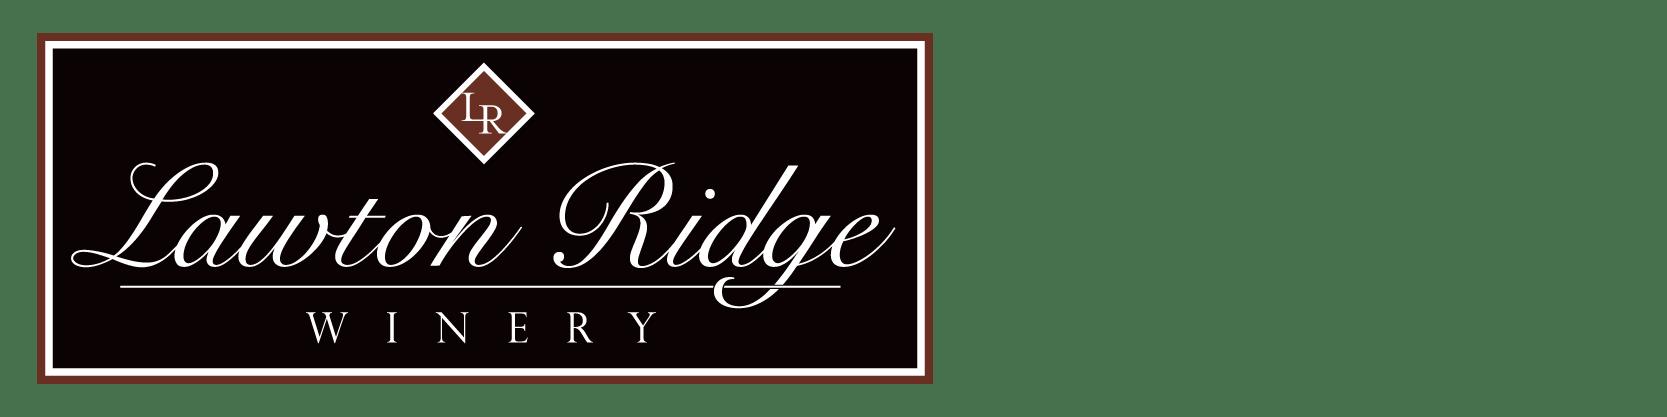 Lawton Ridge Winery